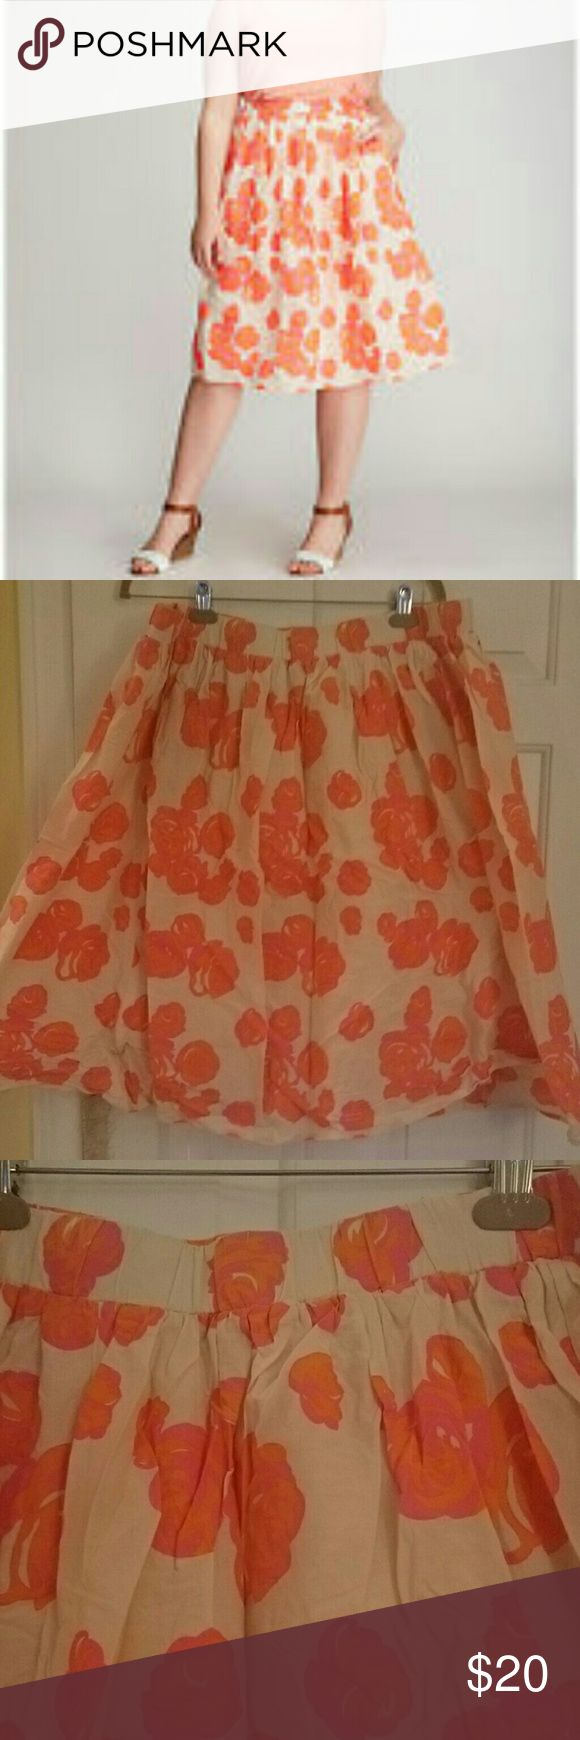 Layne Bryant A-line Midi Skirt Pink and orange floral circle skirt! Only worn a few times. 18/20 elastic waist layne Bryant  Skirts Midi